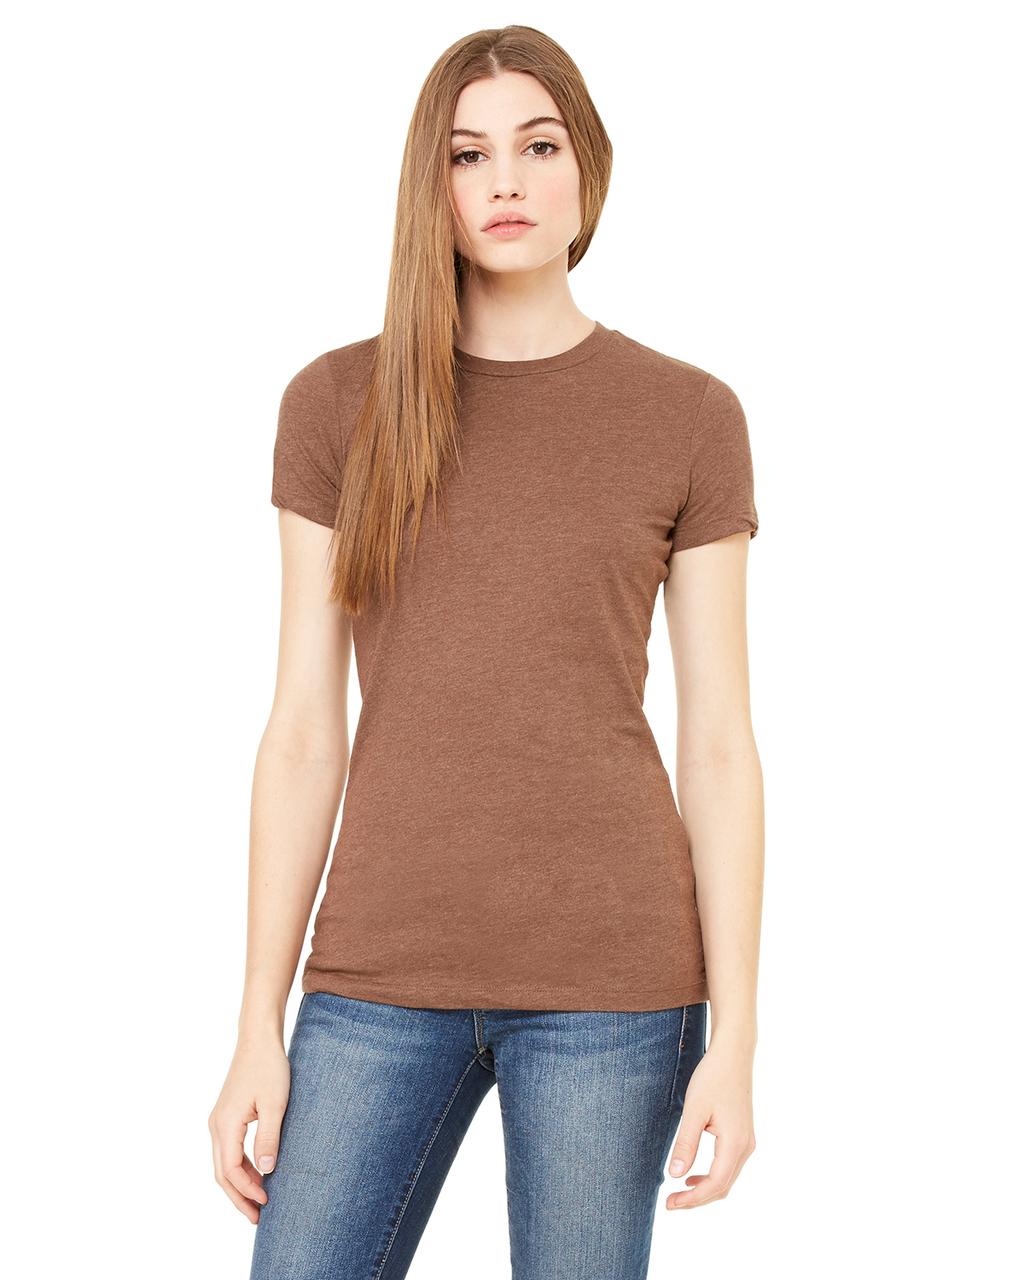 Bella Ladies//Womens The Favourite Tee Short Sleeve T-Shirt